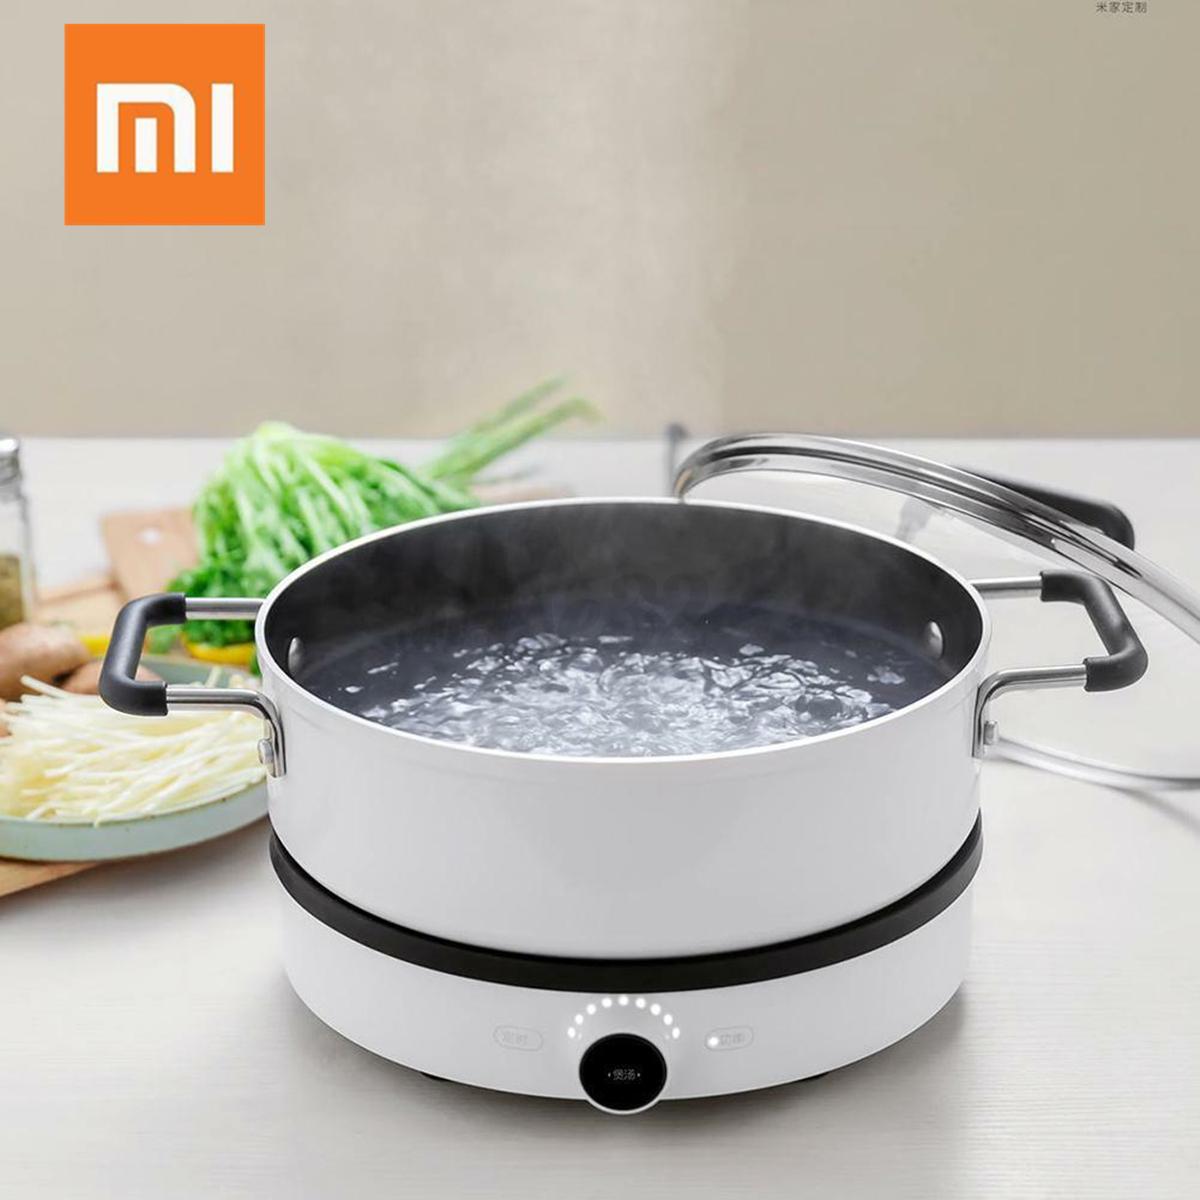 Xiaomi Mijia Electric Induction Cooktop Stockpot Cooker Burn